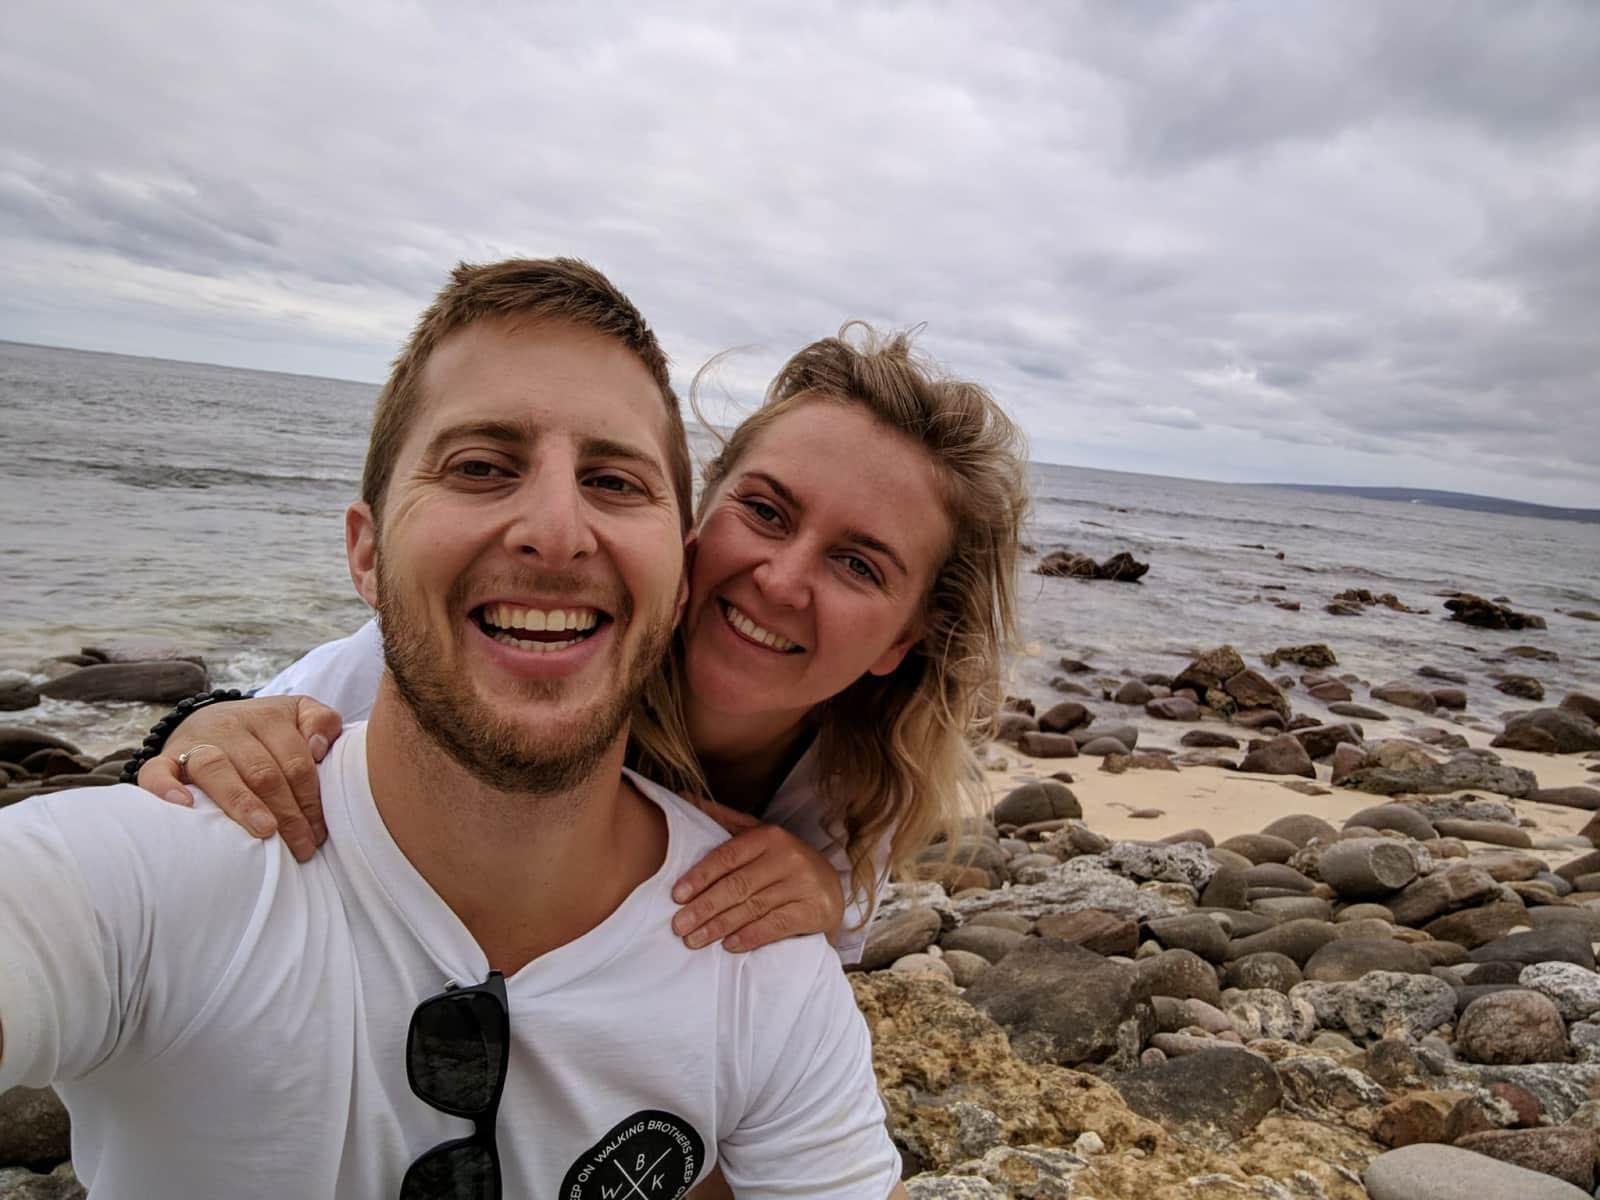 Nicola & Aaron from Perth, Western Australia, Australia